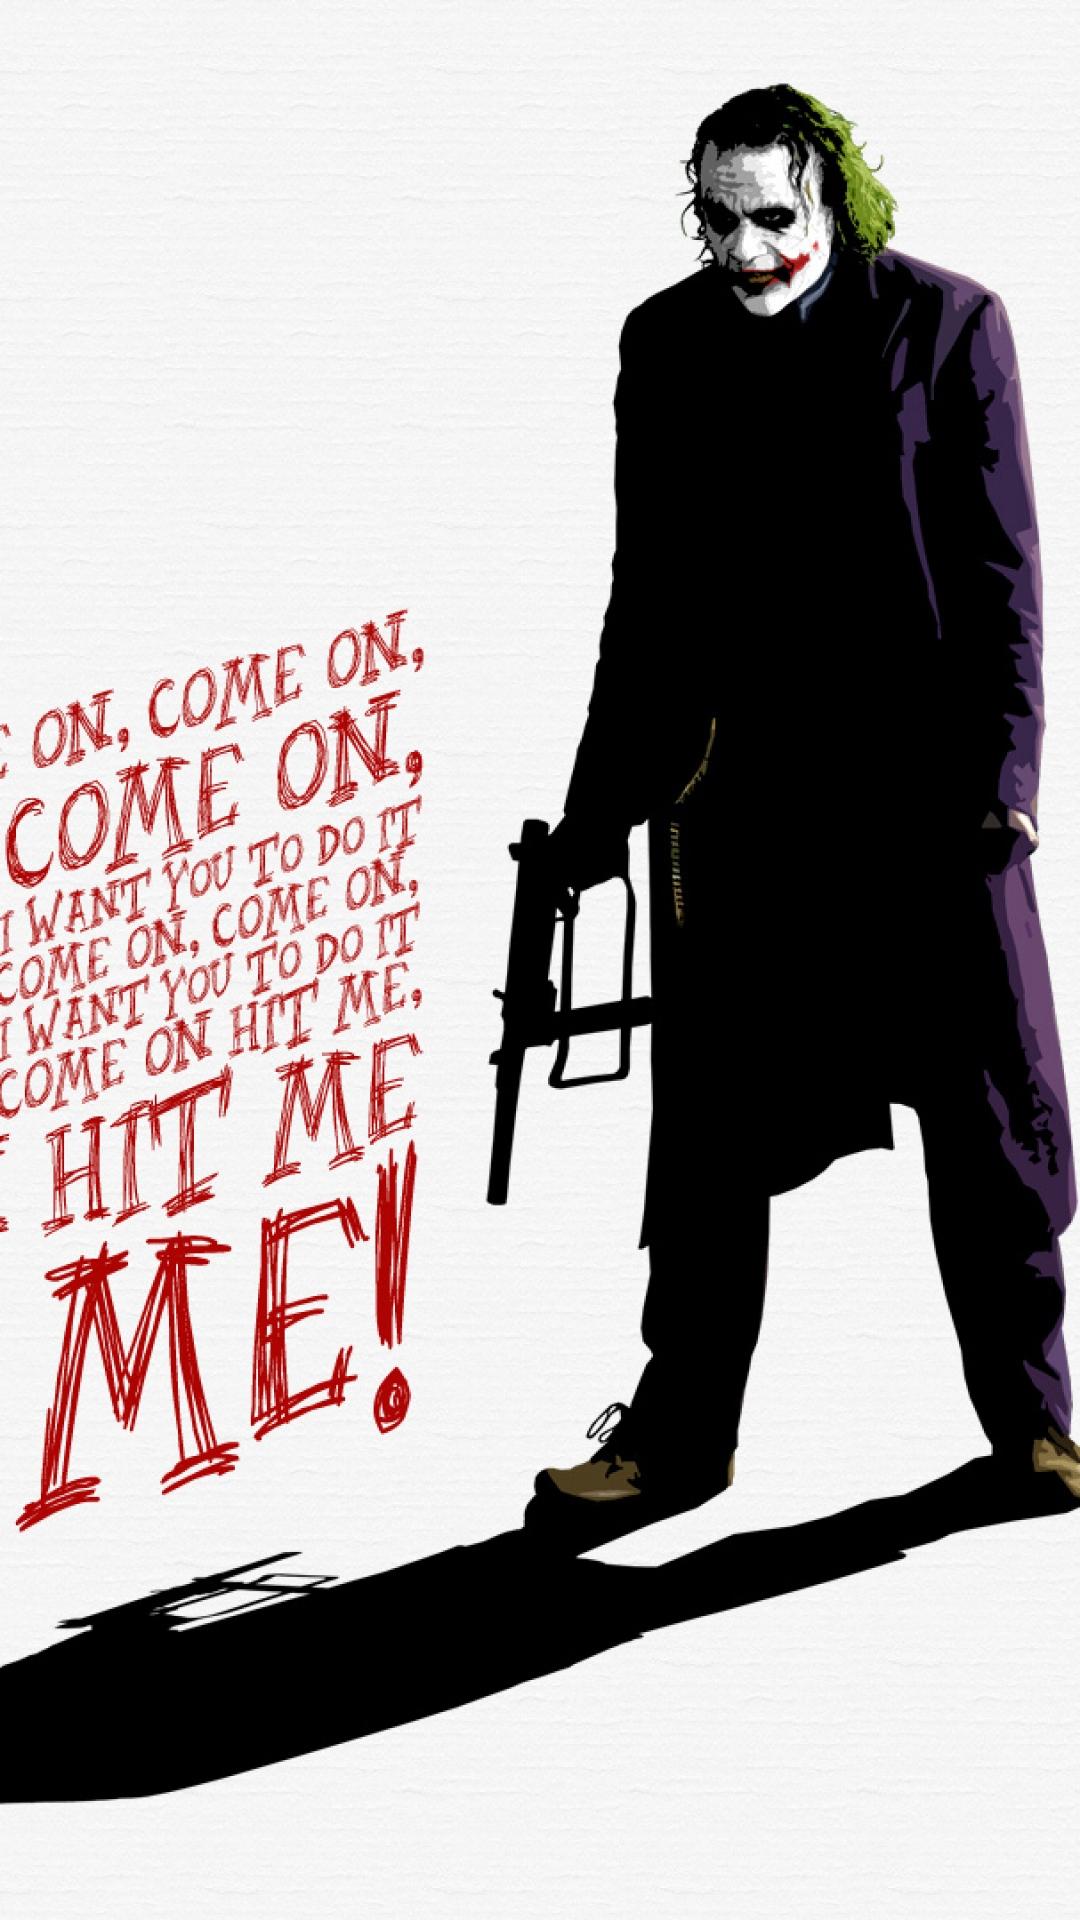 Joker Wallpaper Heath Ledger The Dark Knight 98496 1080x1920